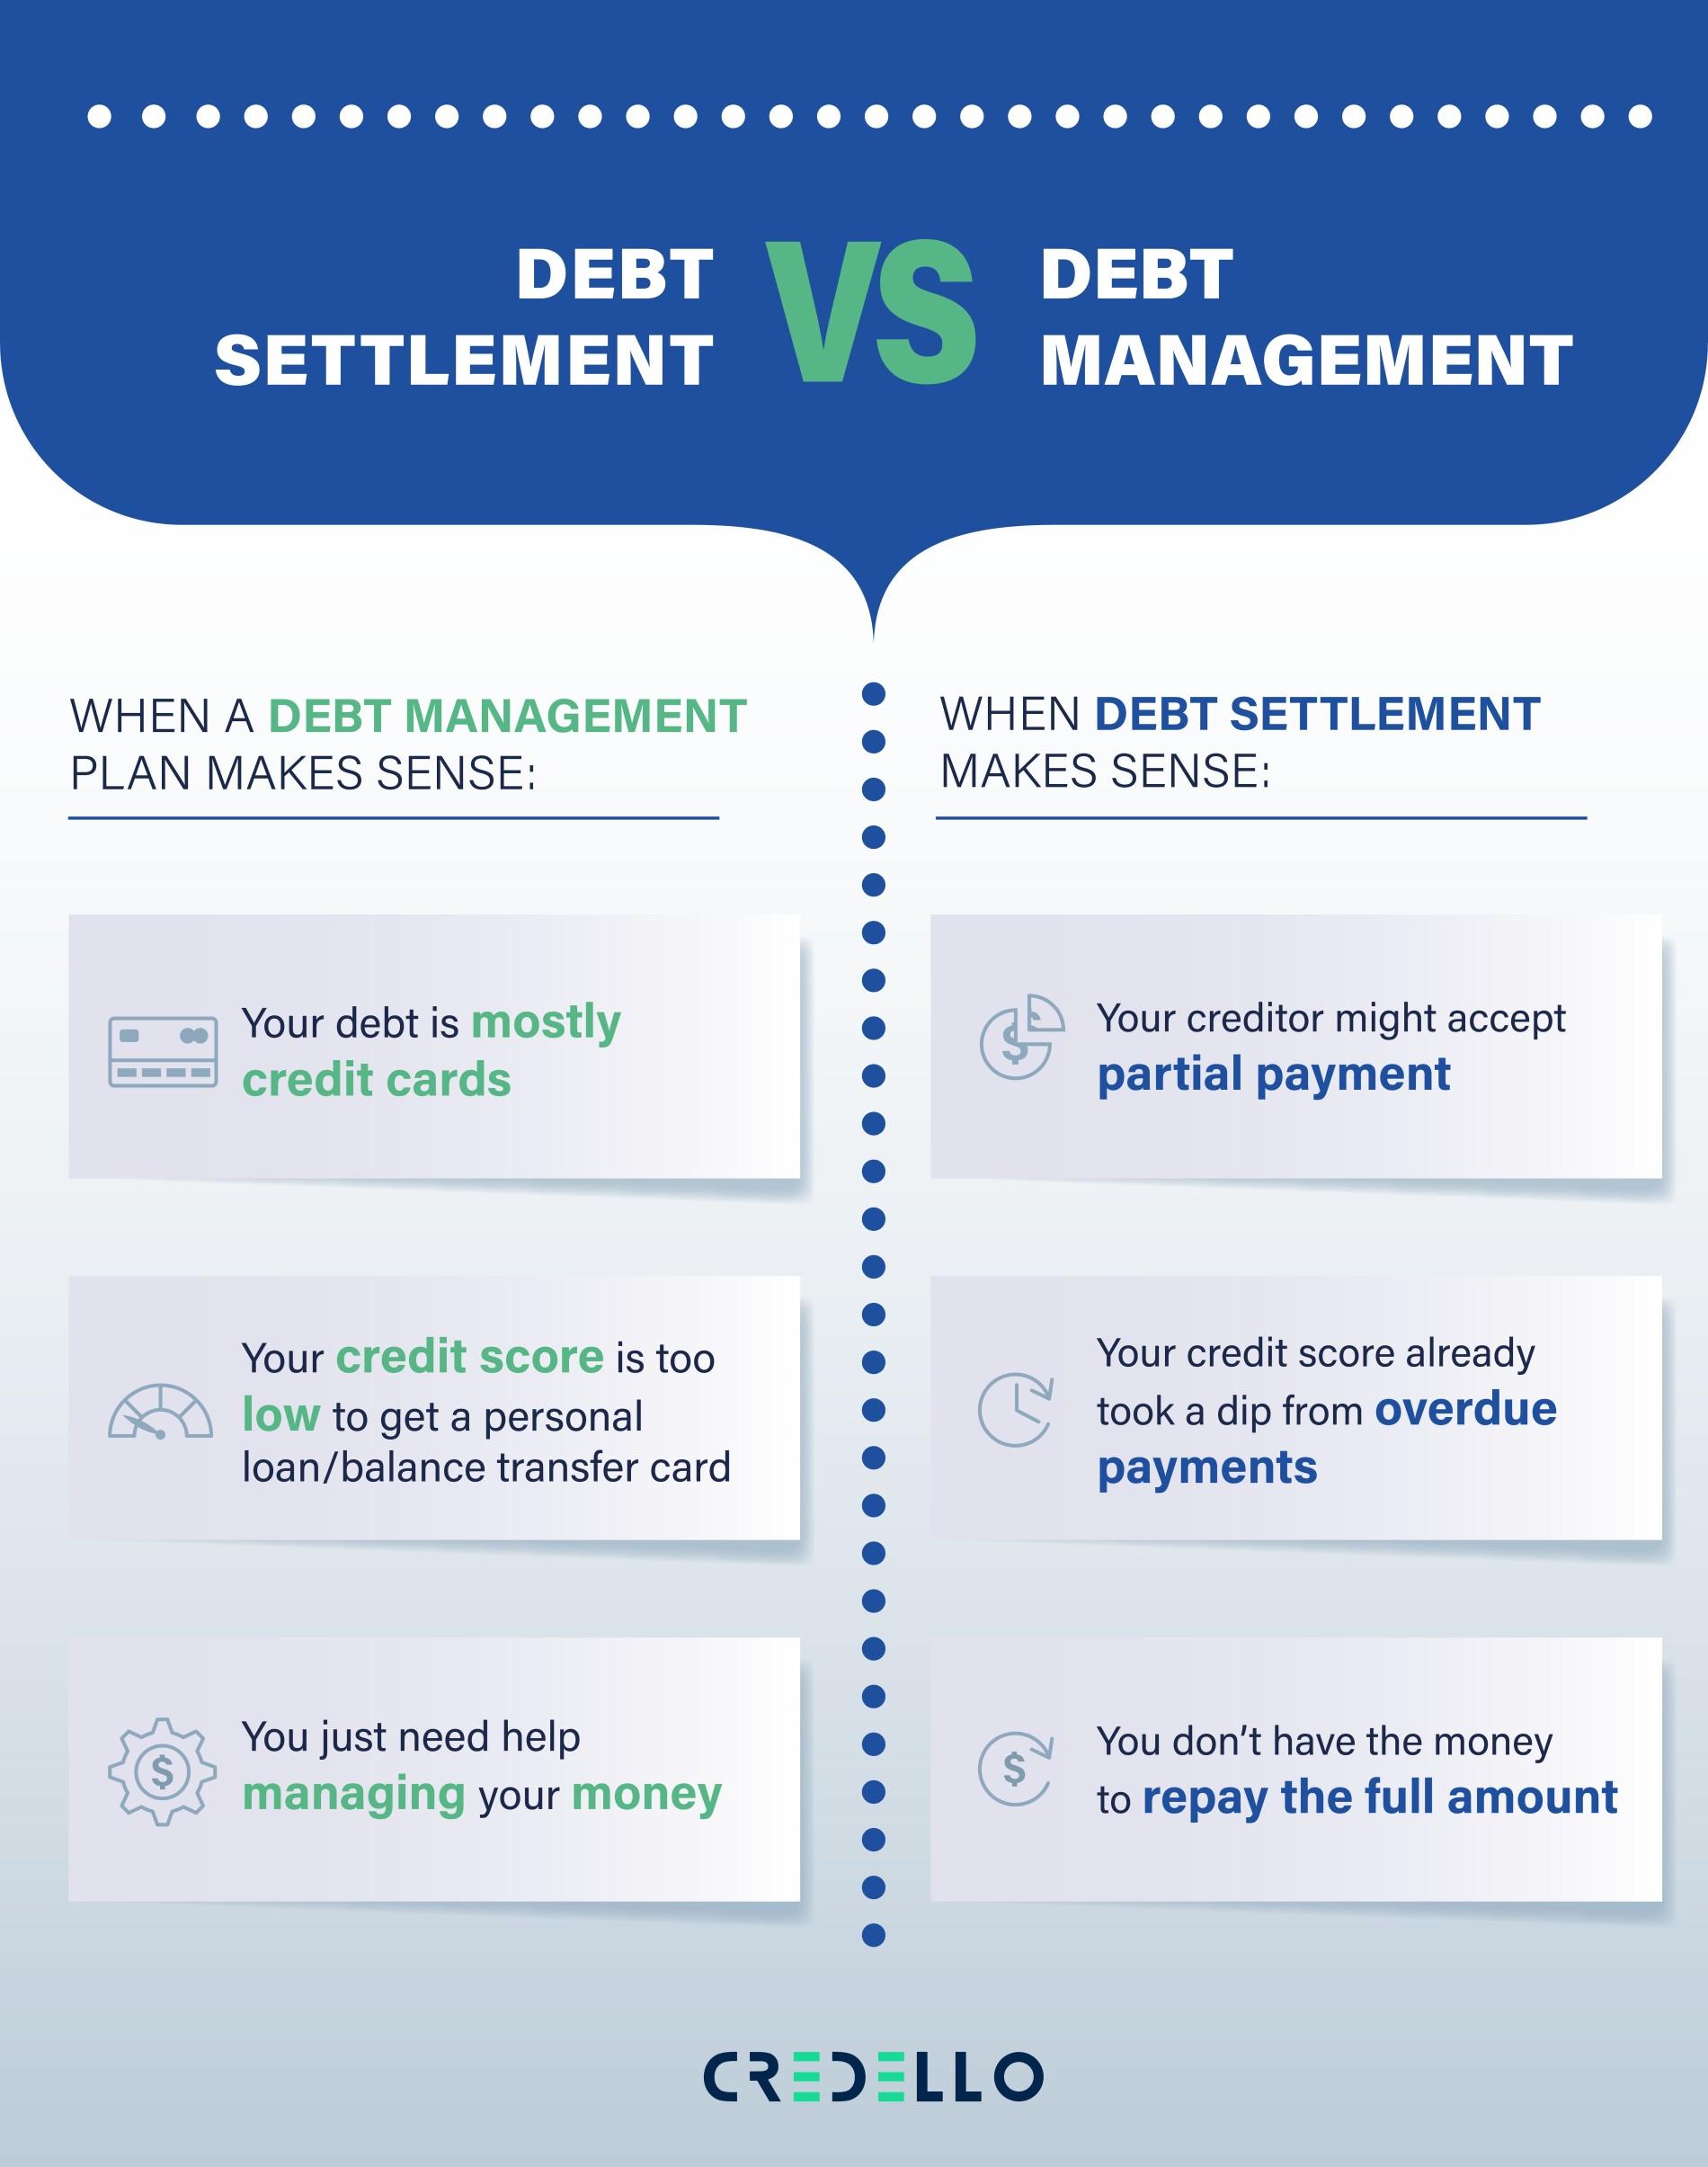 Difference between Debt Settlement and Debt Management